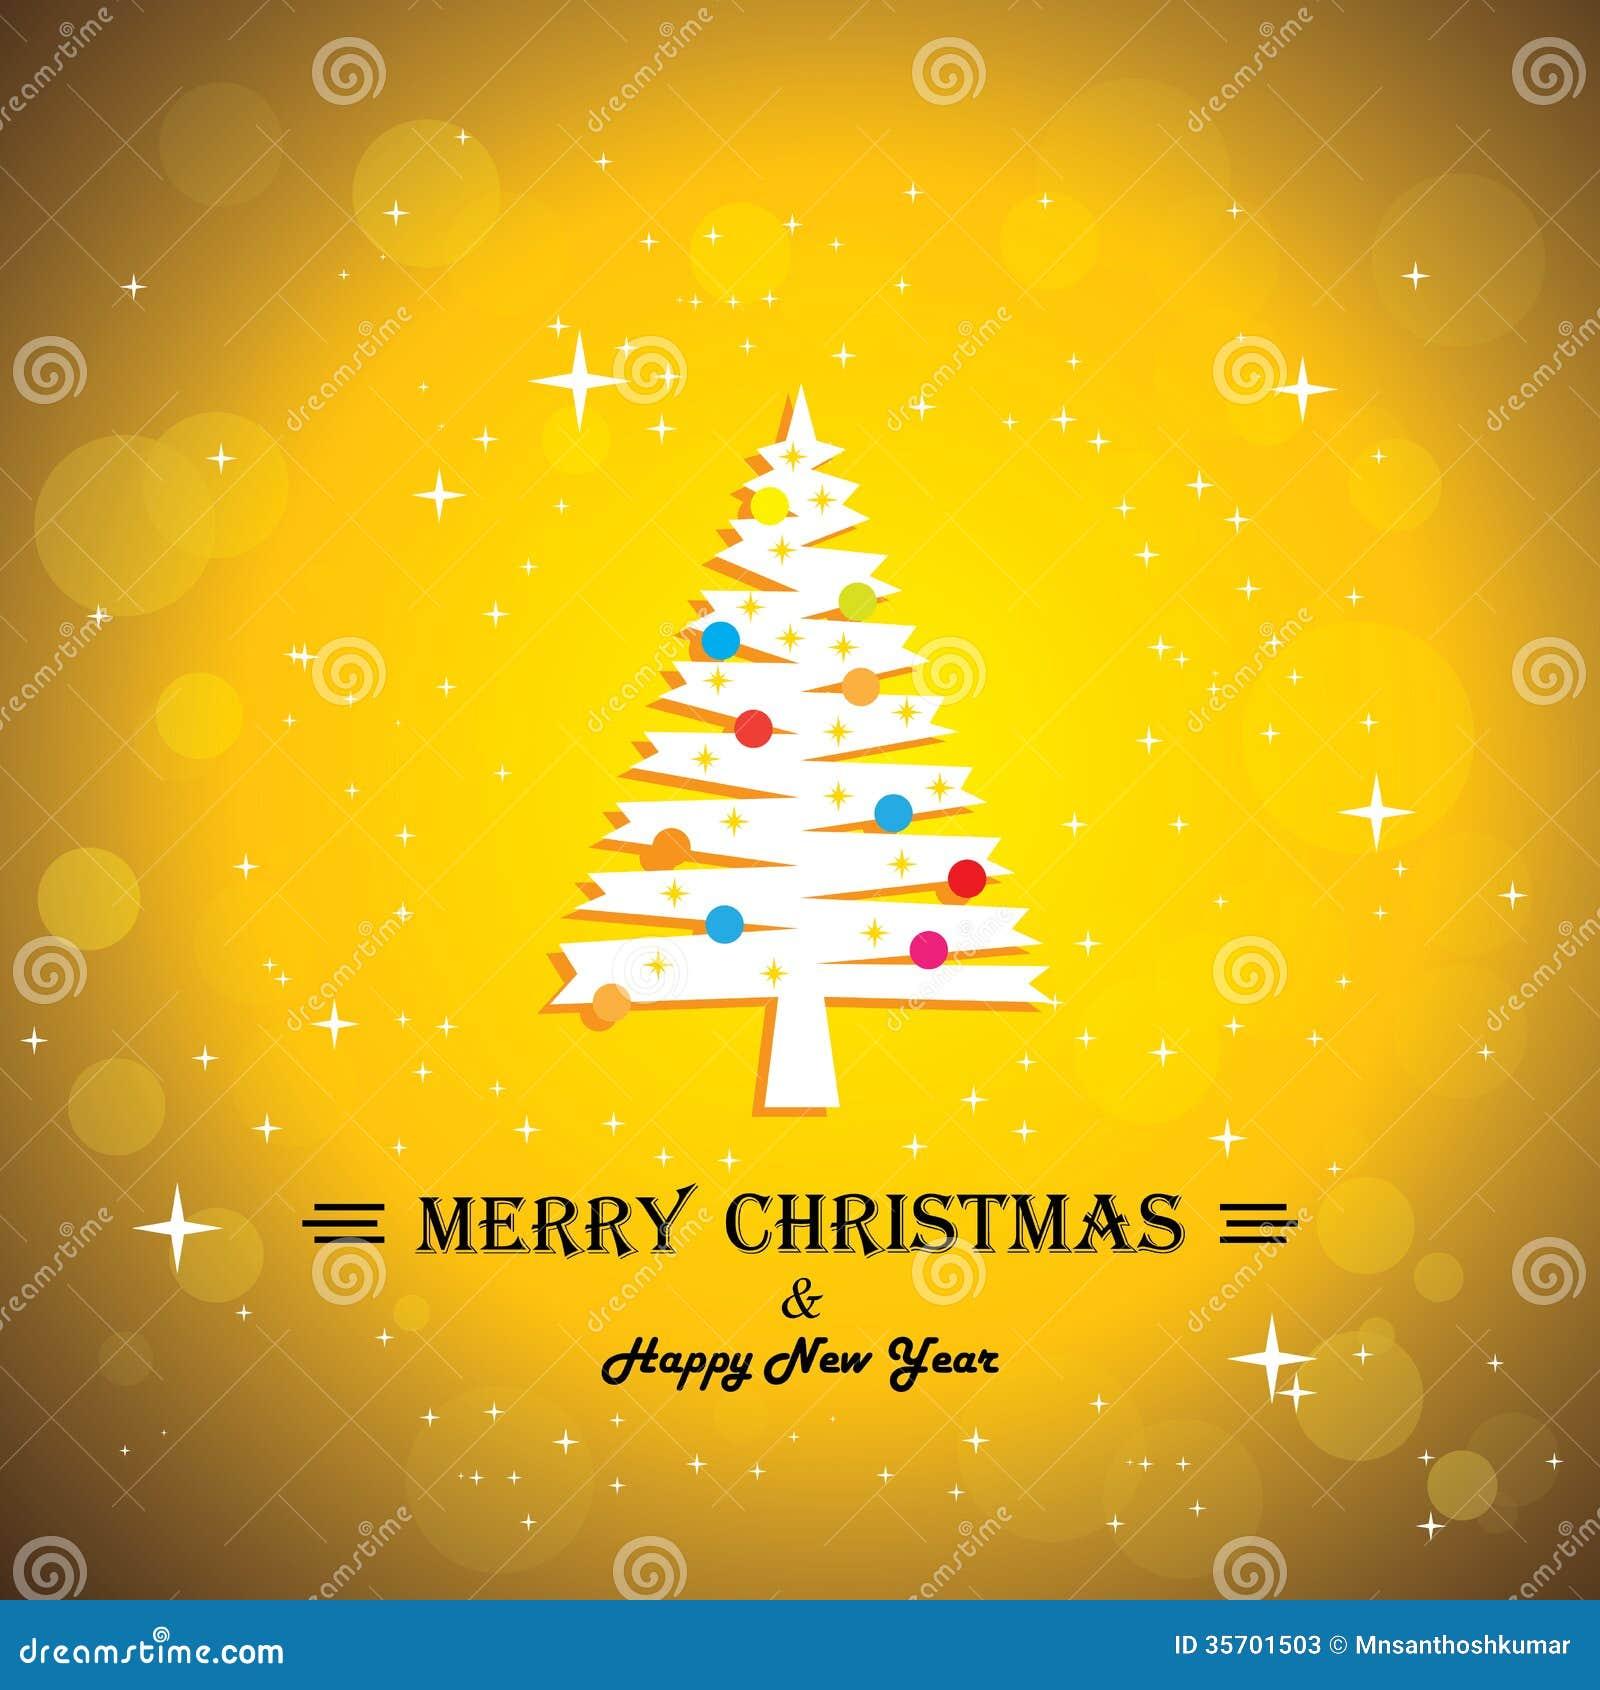 Merry Christmas Greeting Card Poster & Xmas Tree - Stock ...